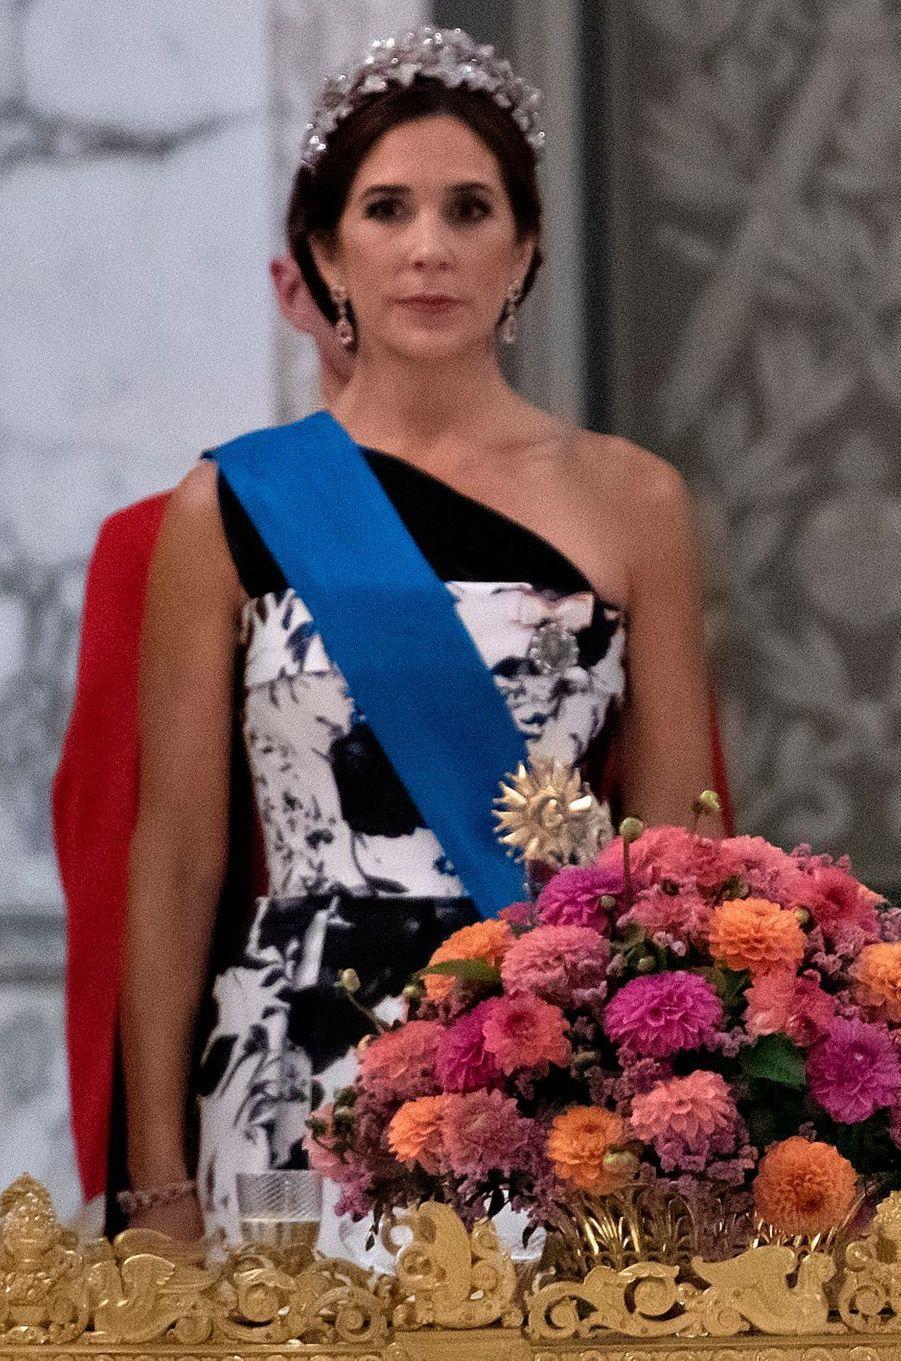 La princesse Mary de Danemark, le 28 août 2018